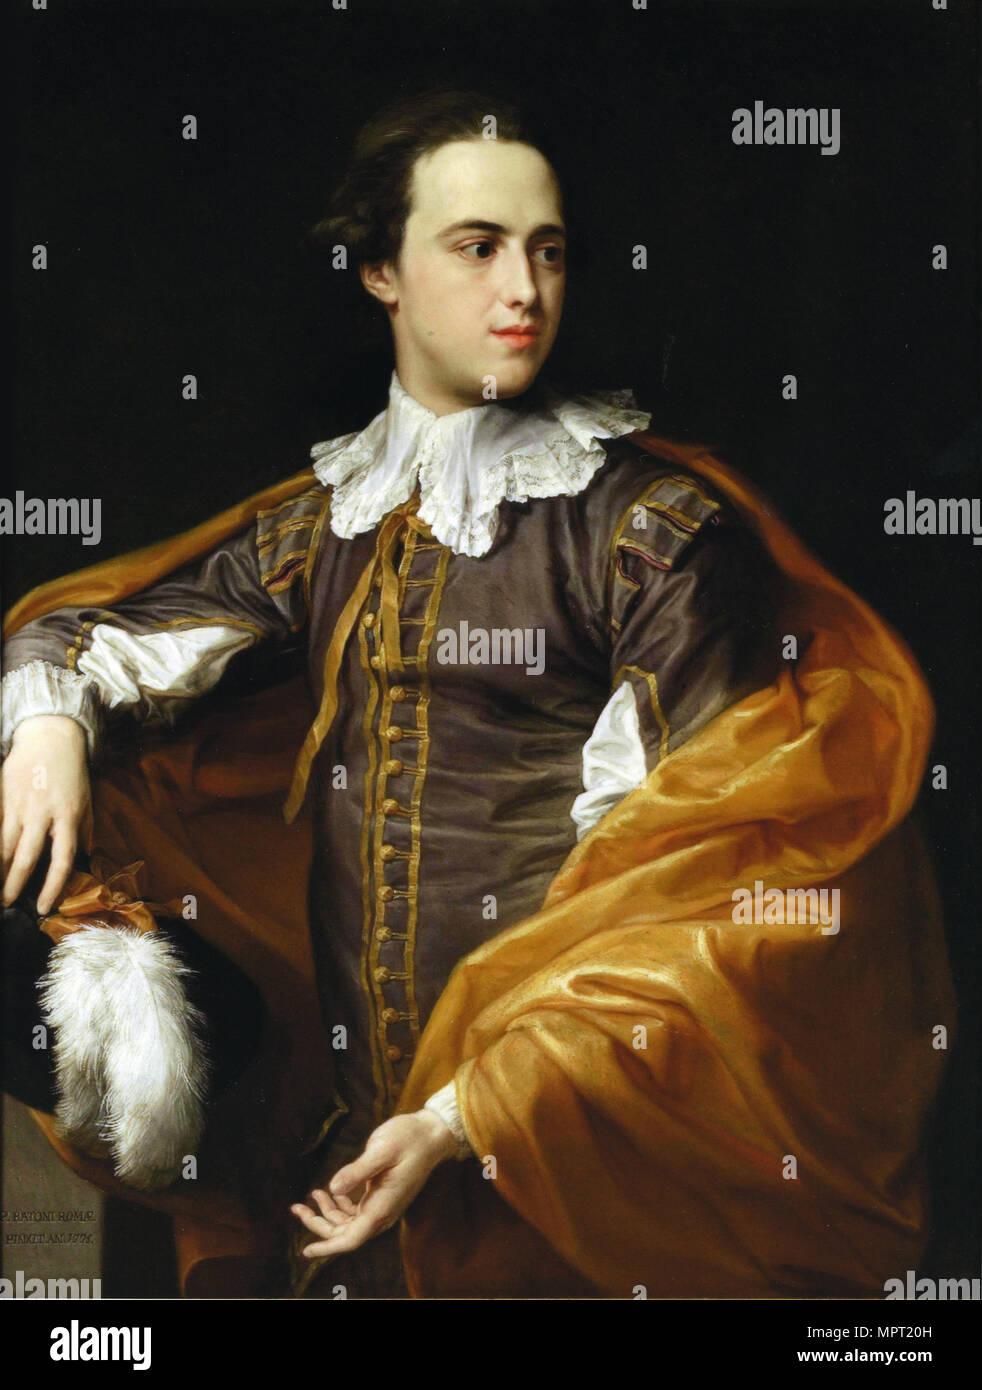 Portrait of Sir Charles Watson, 1775. - Stock Image